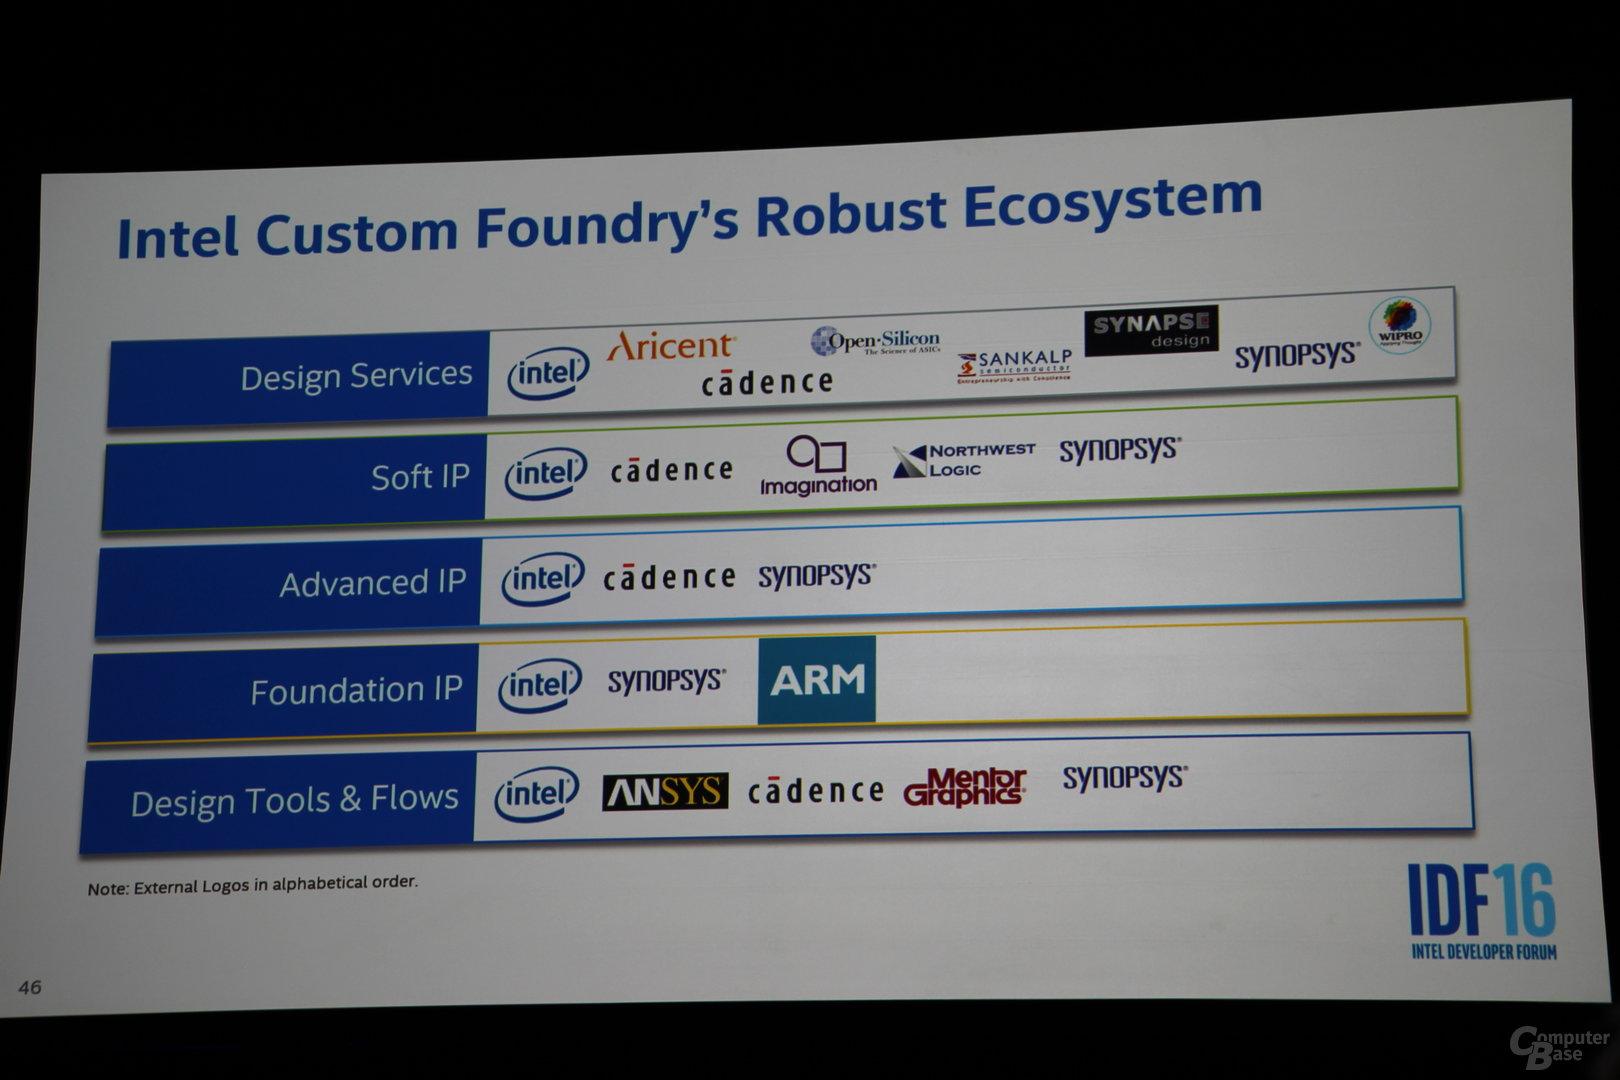 Intel Custom Foundry